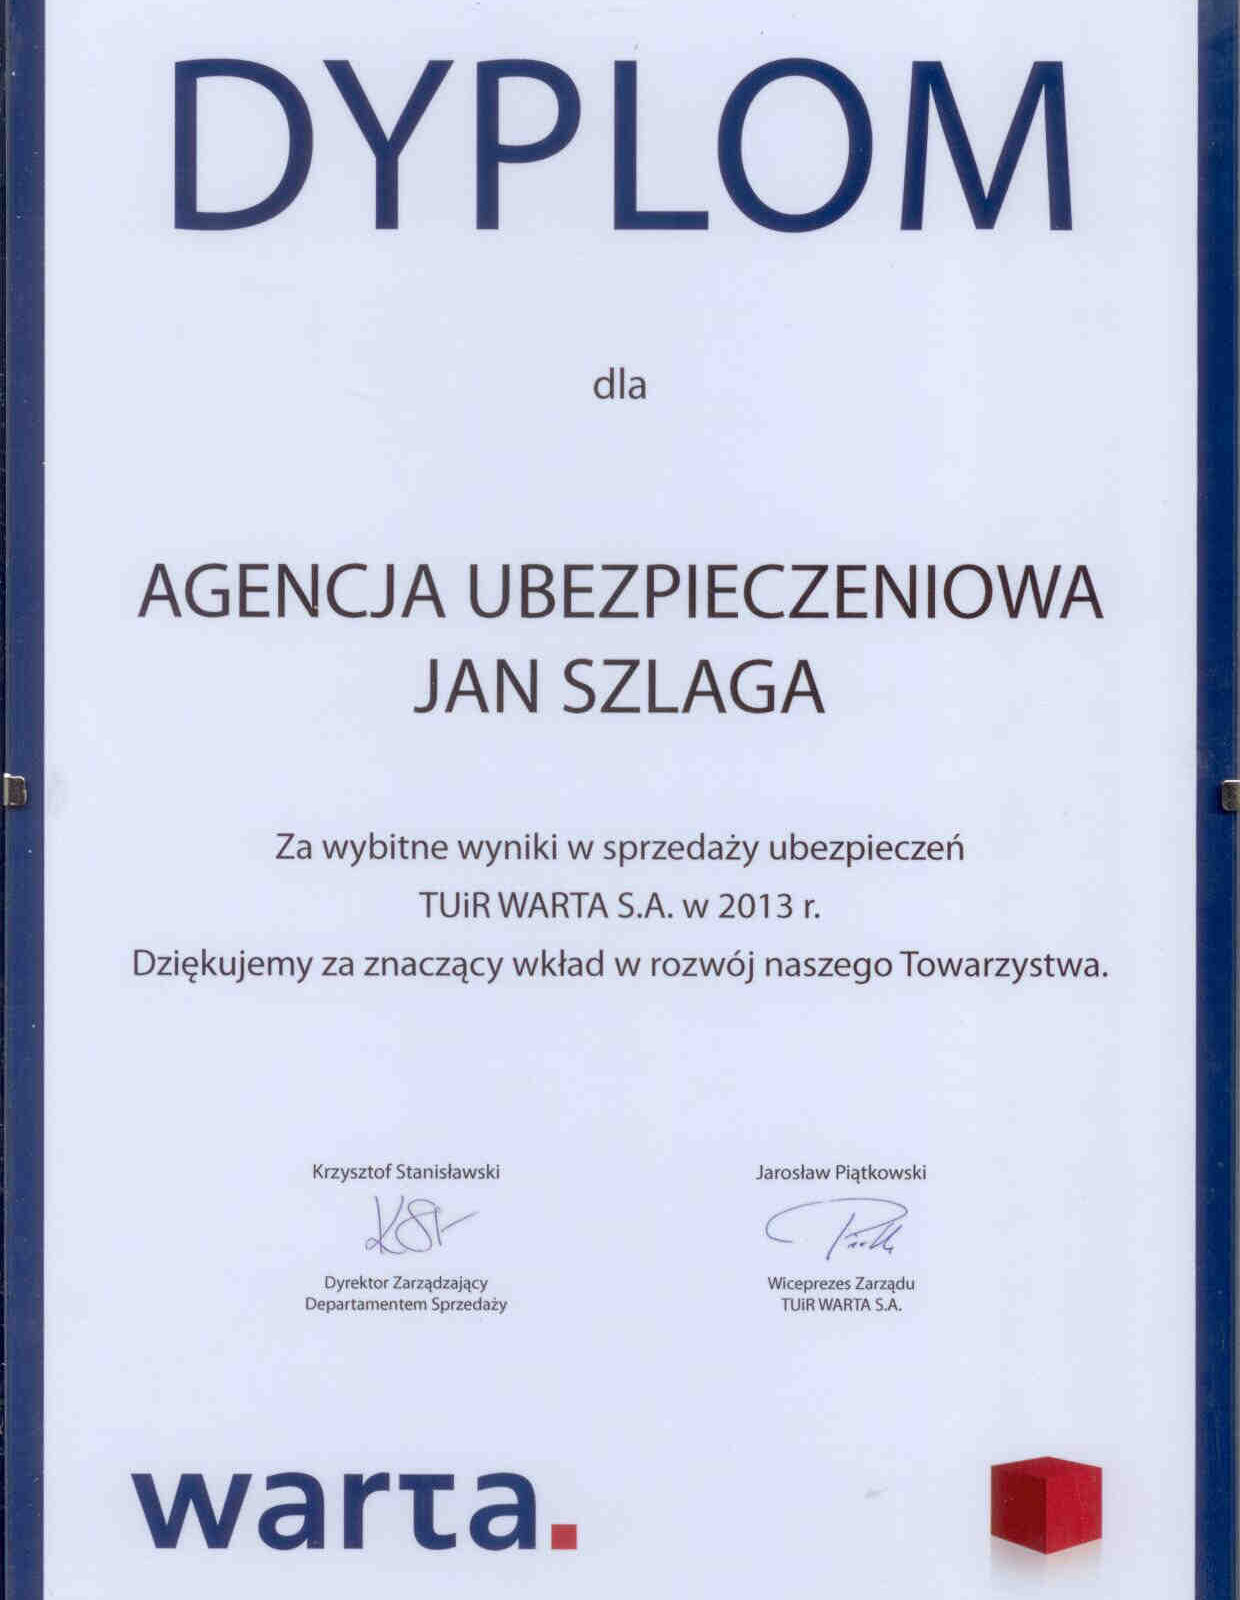 Top Partner 2013 Warta Nowy Targ Harcerska 5 Szlaga Piotr Jan